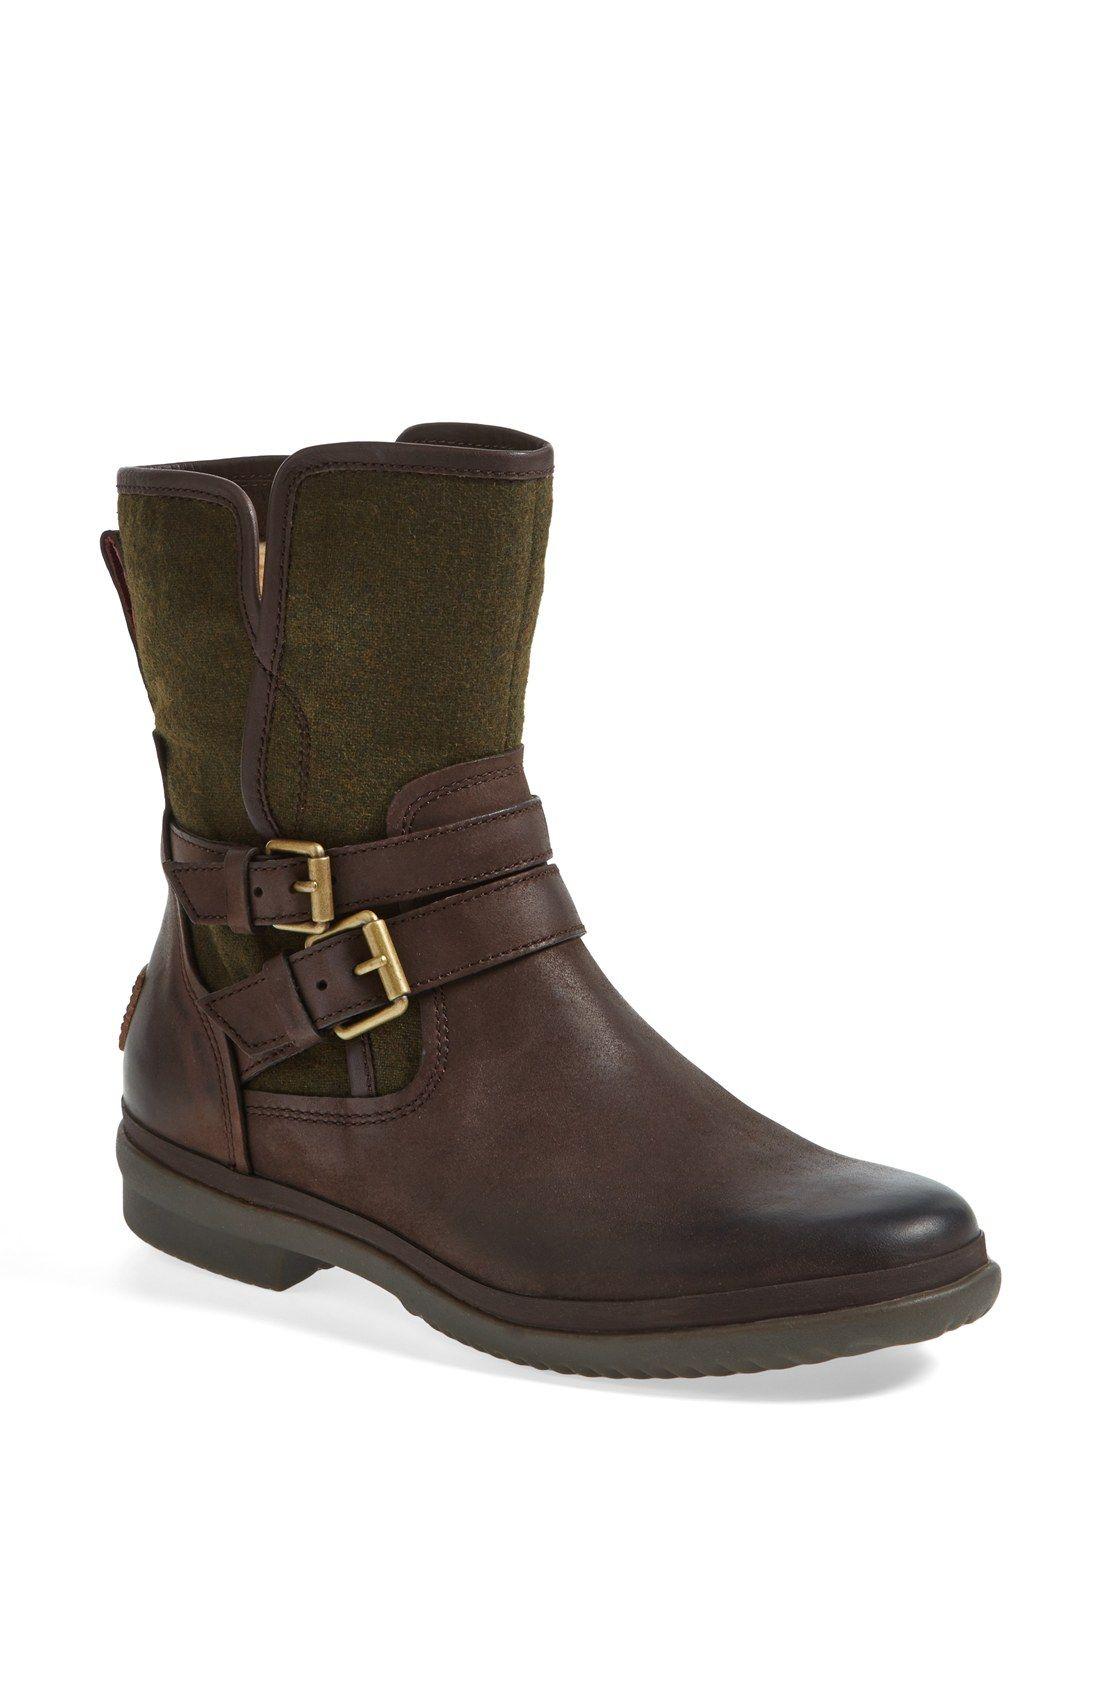 89d5bd3ea20 UGG® Australia 'Simmens' Waterproof Leather Boot (Women) | Style ...